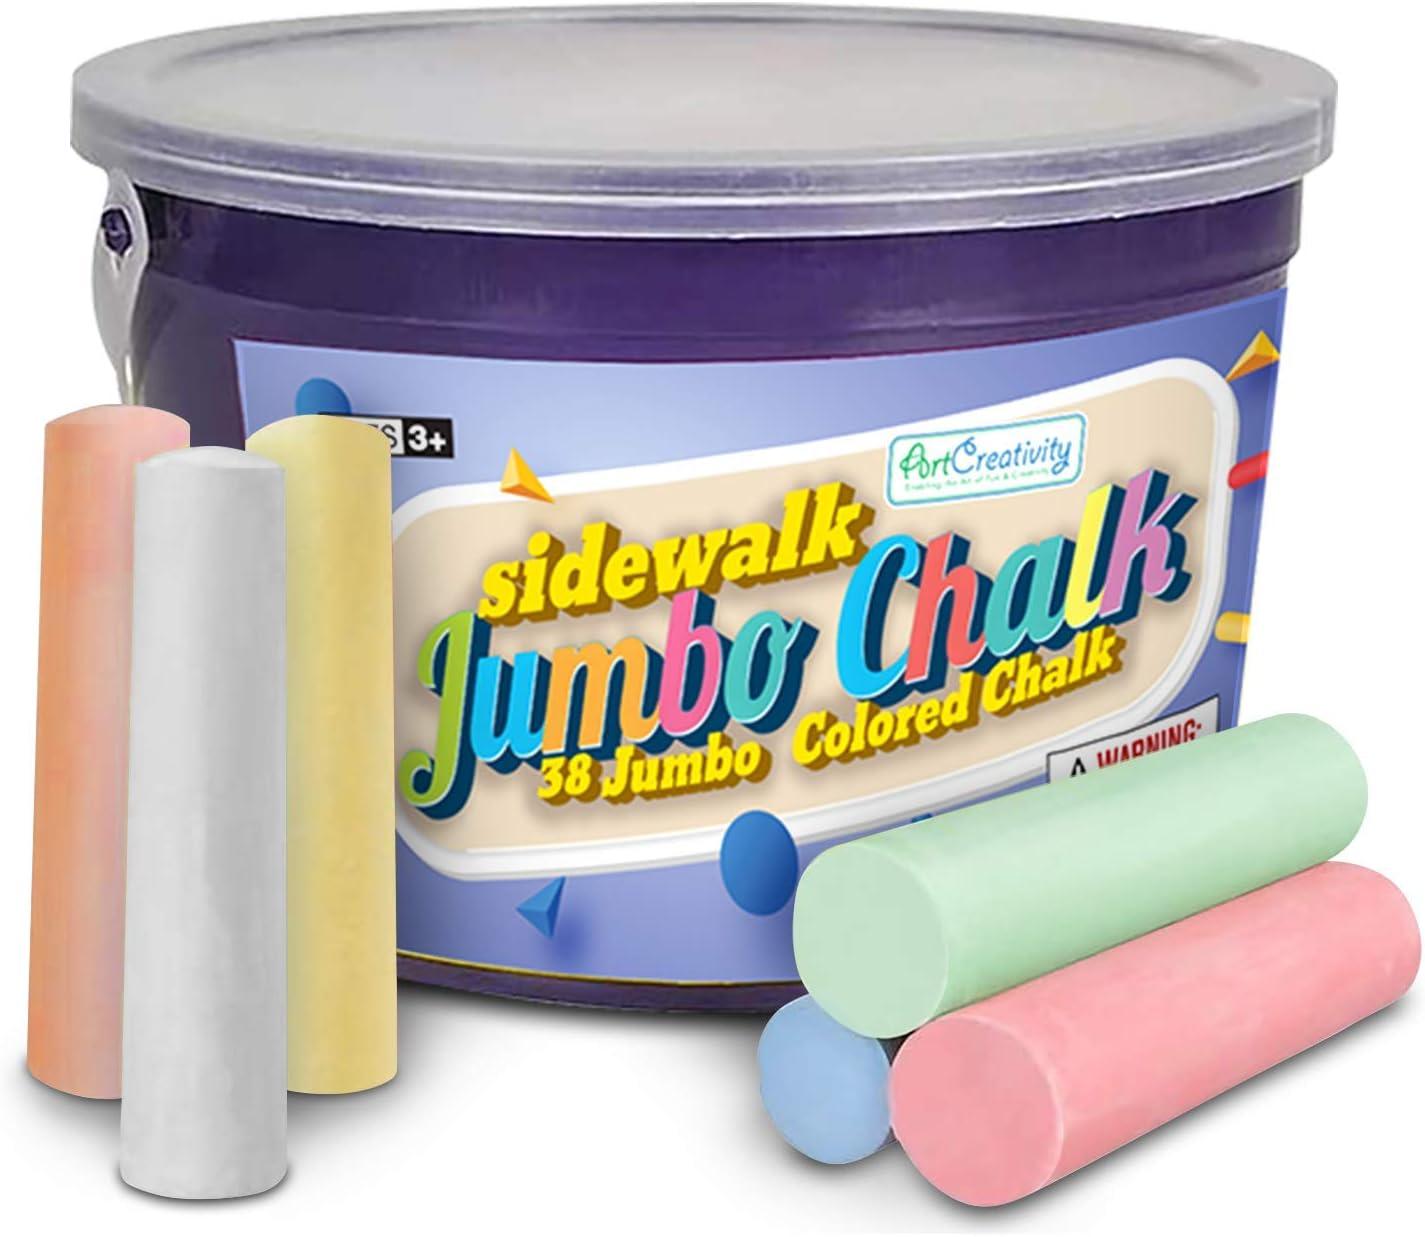 Kids Jumbo Pavement Chalks Large Hopscotch Chalk Street Chalks Fun Art Game Coloured Anti Dust Assorted Sidewalk Set Water-soluble Safe Pens Chalk Dinapy 12 Pcs Chalks